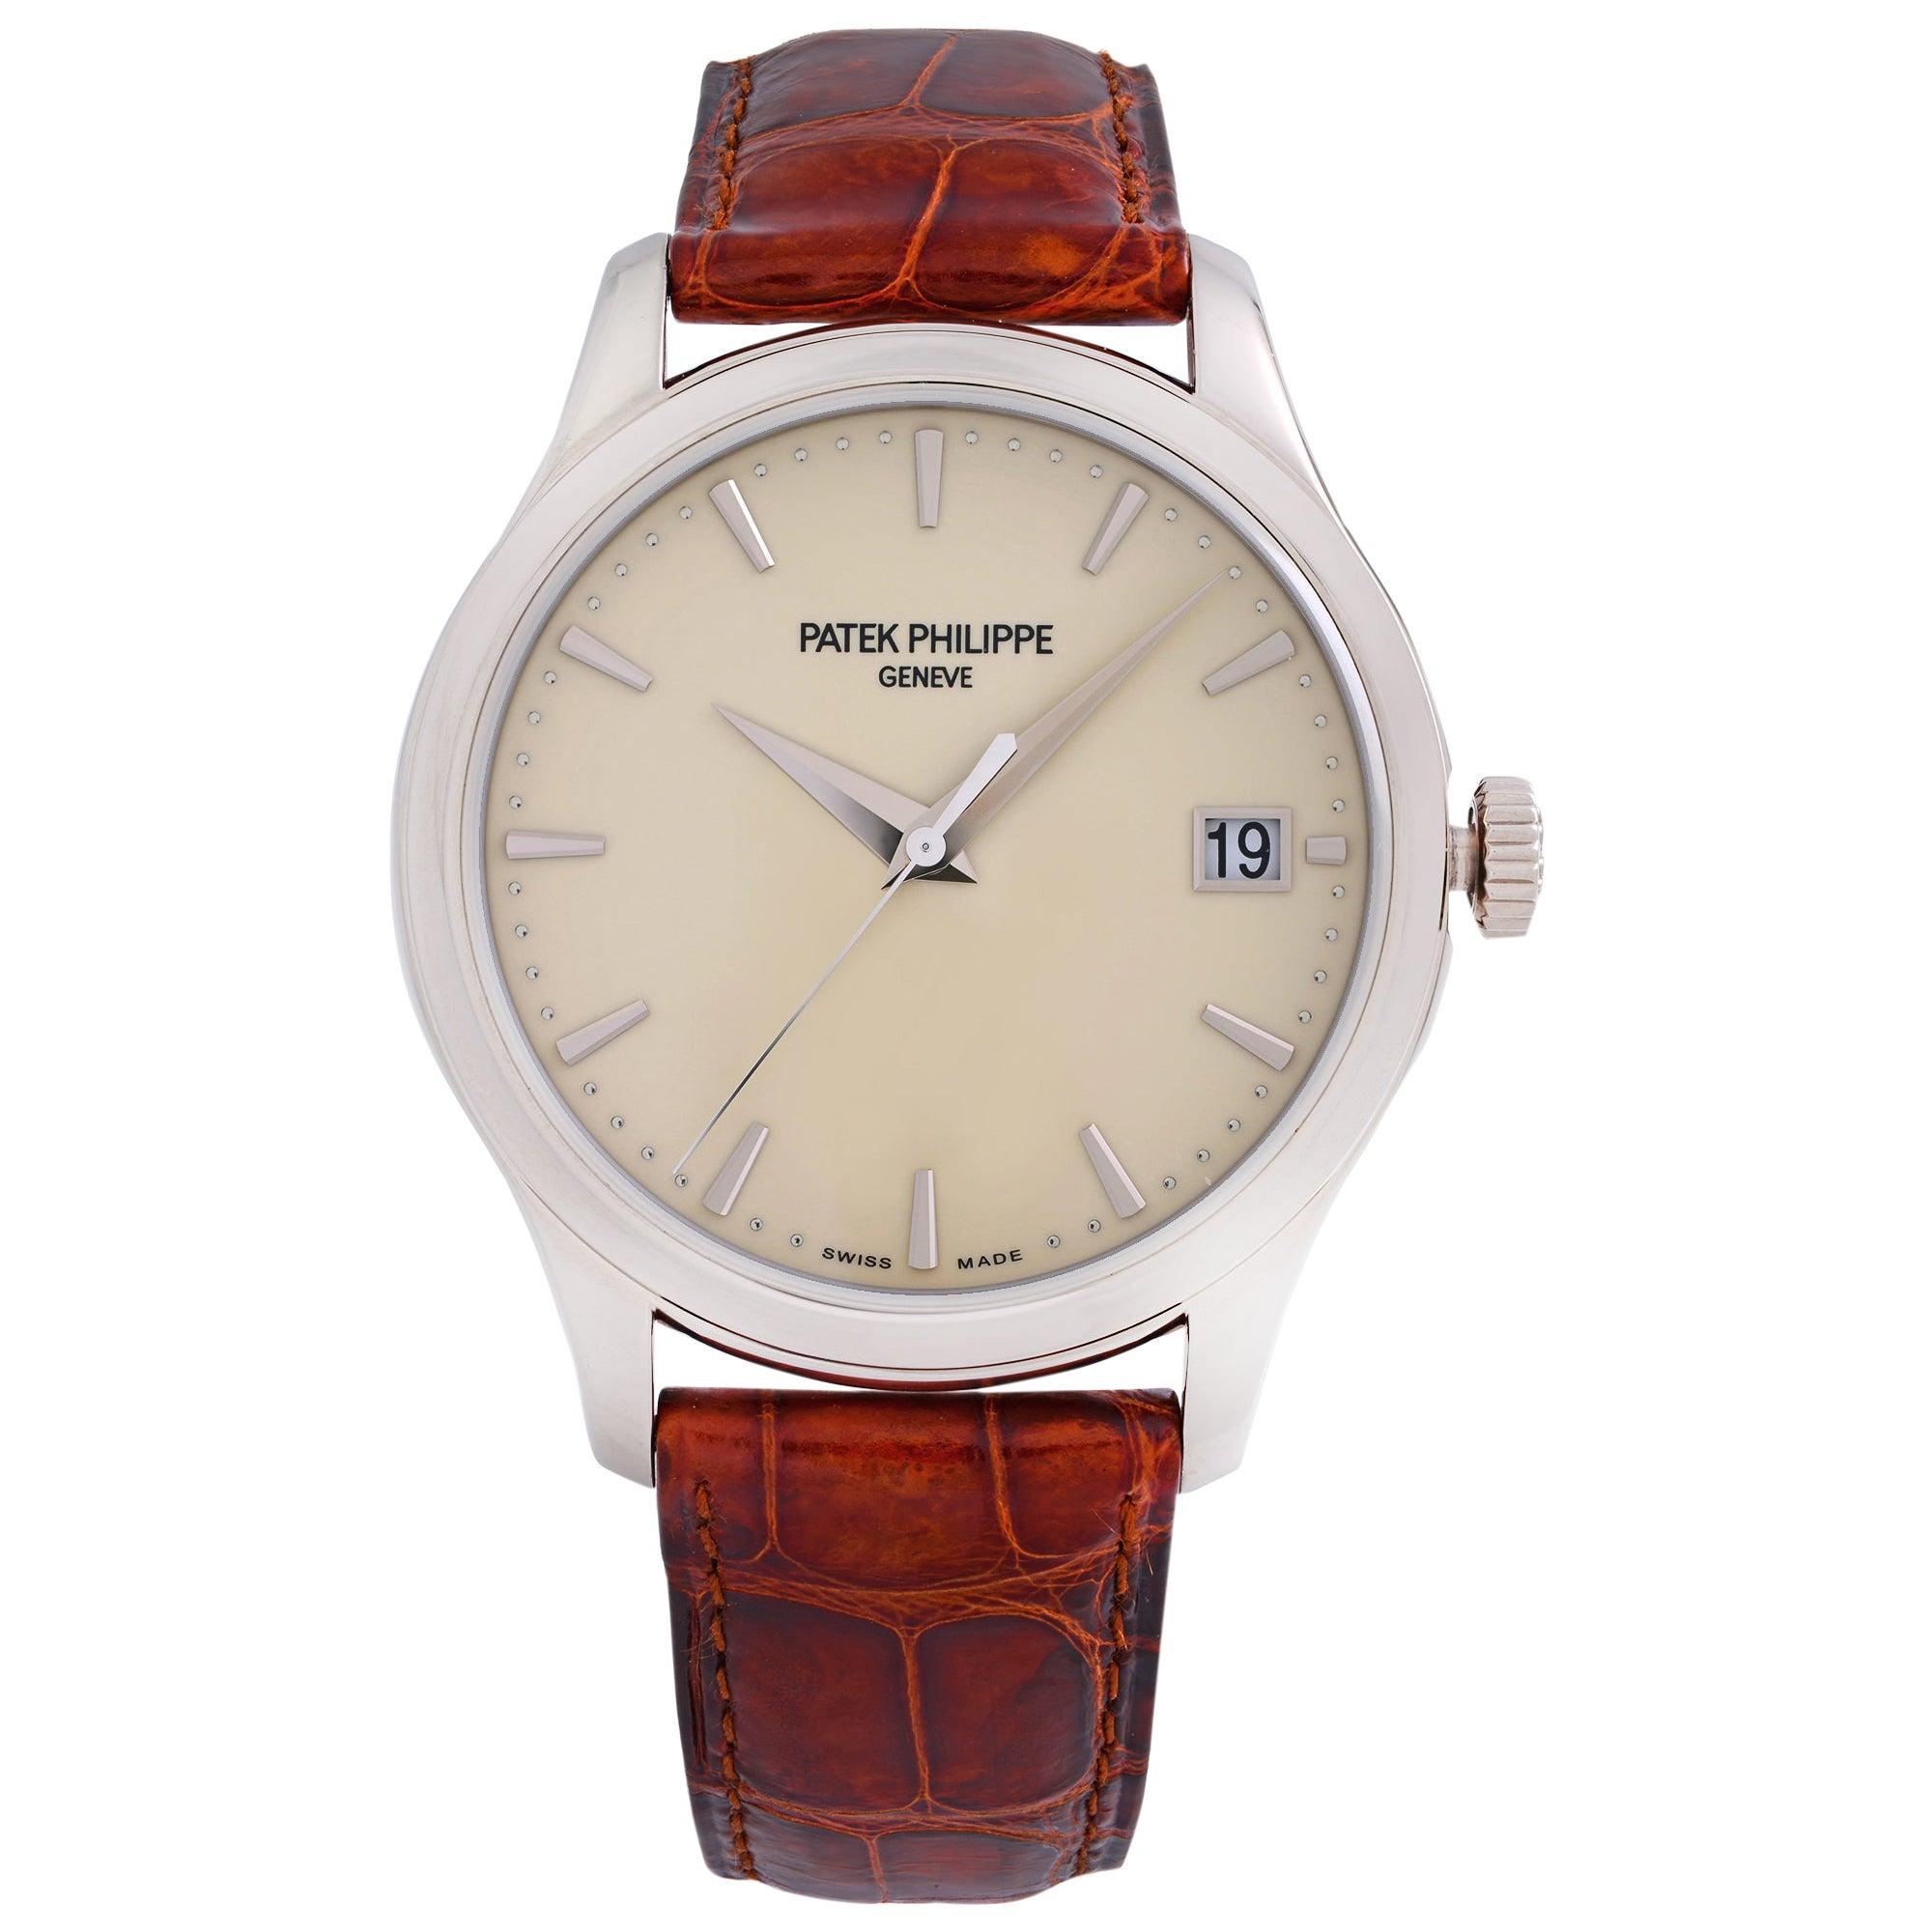 Patek Philippe Calatrava 18K White Gold Beige Dial Automatic Men Watch 5227G-001